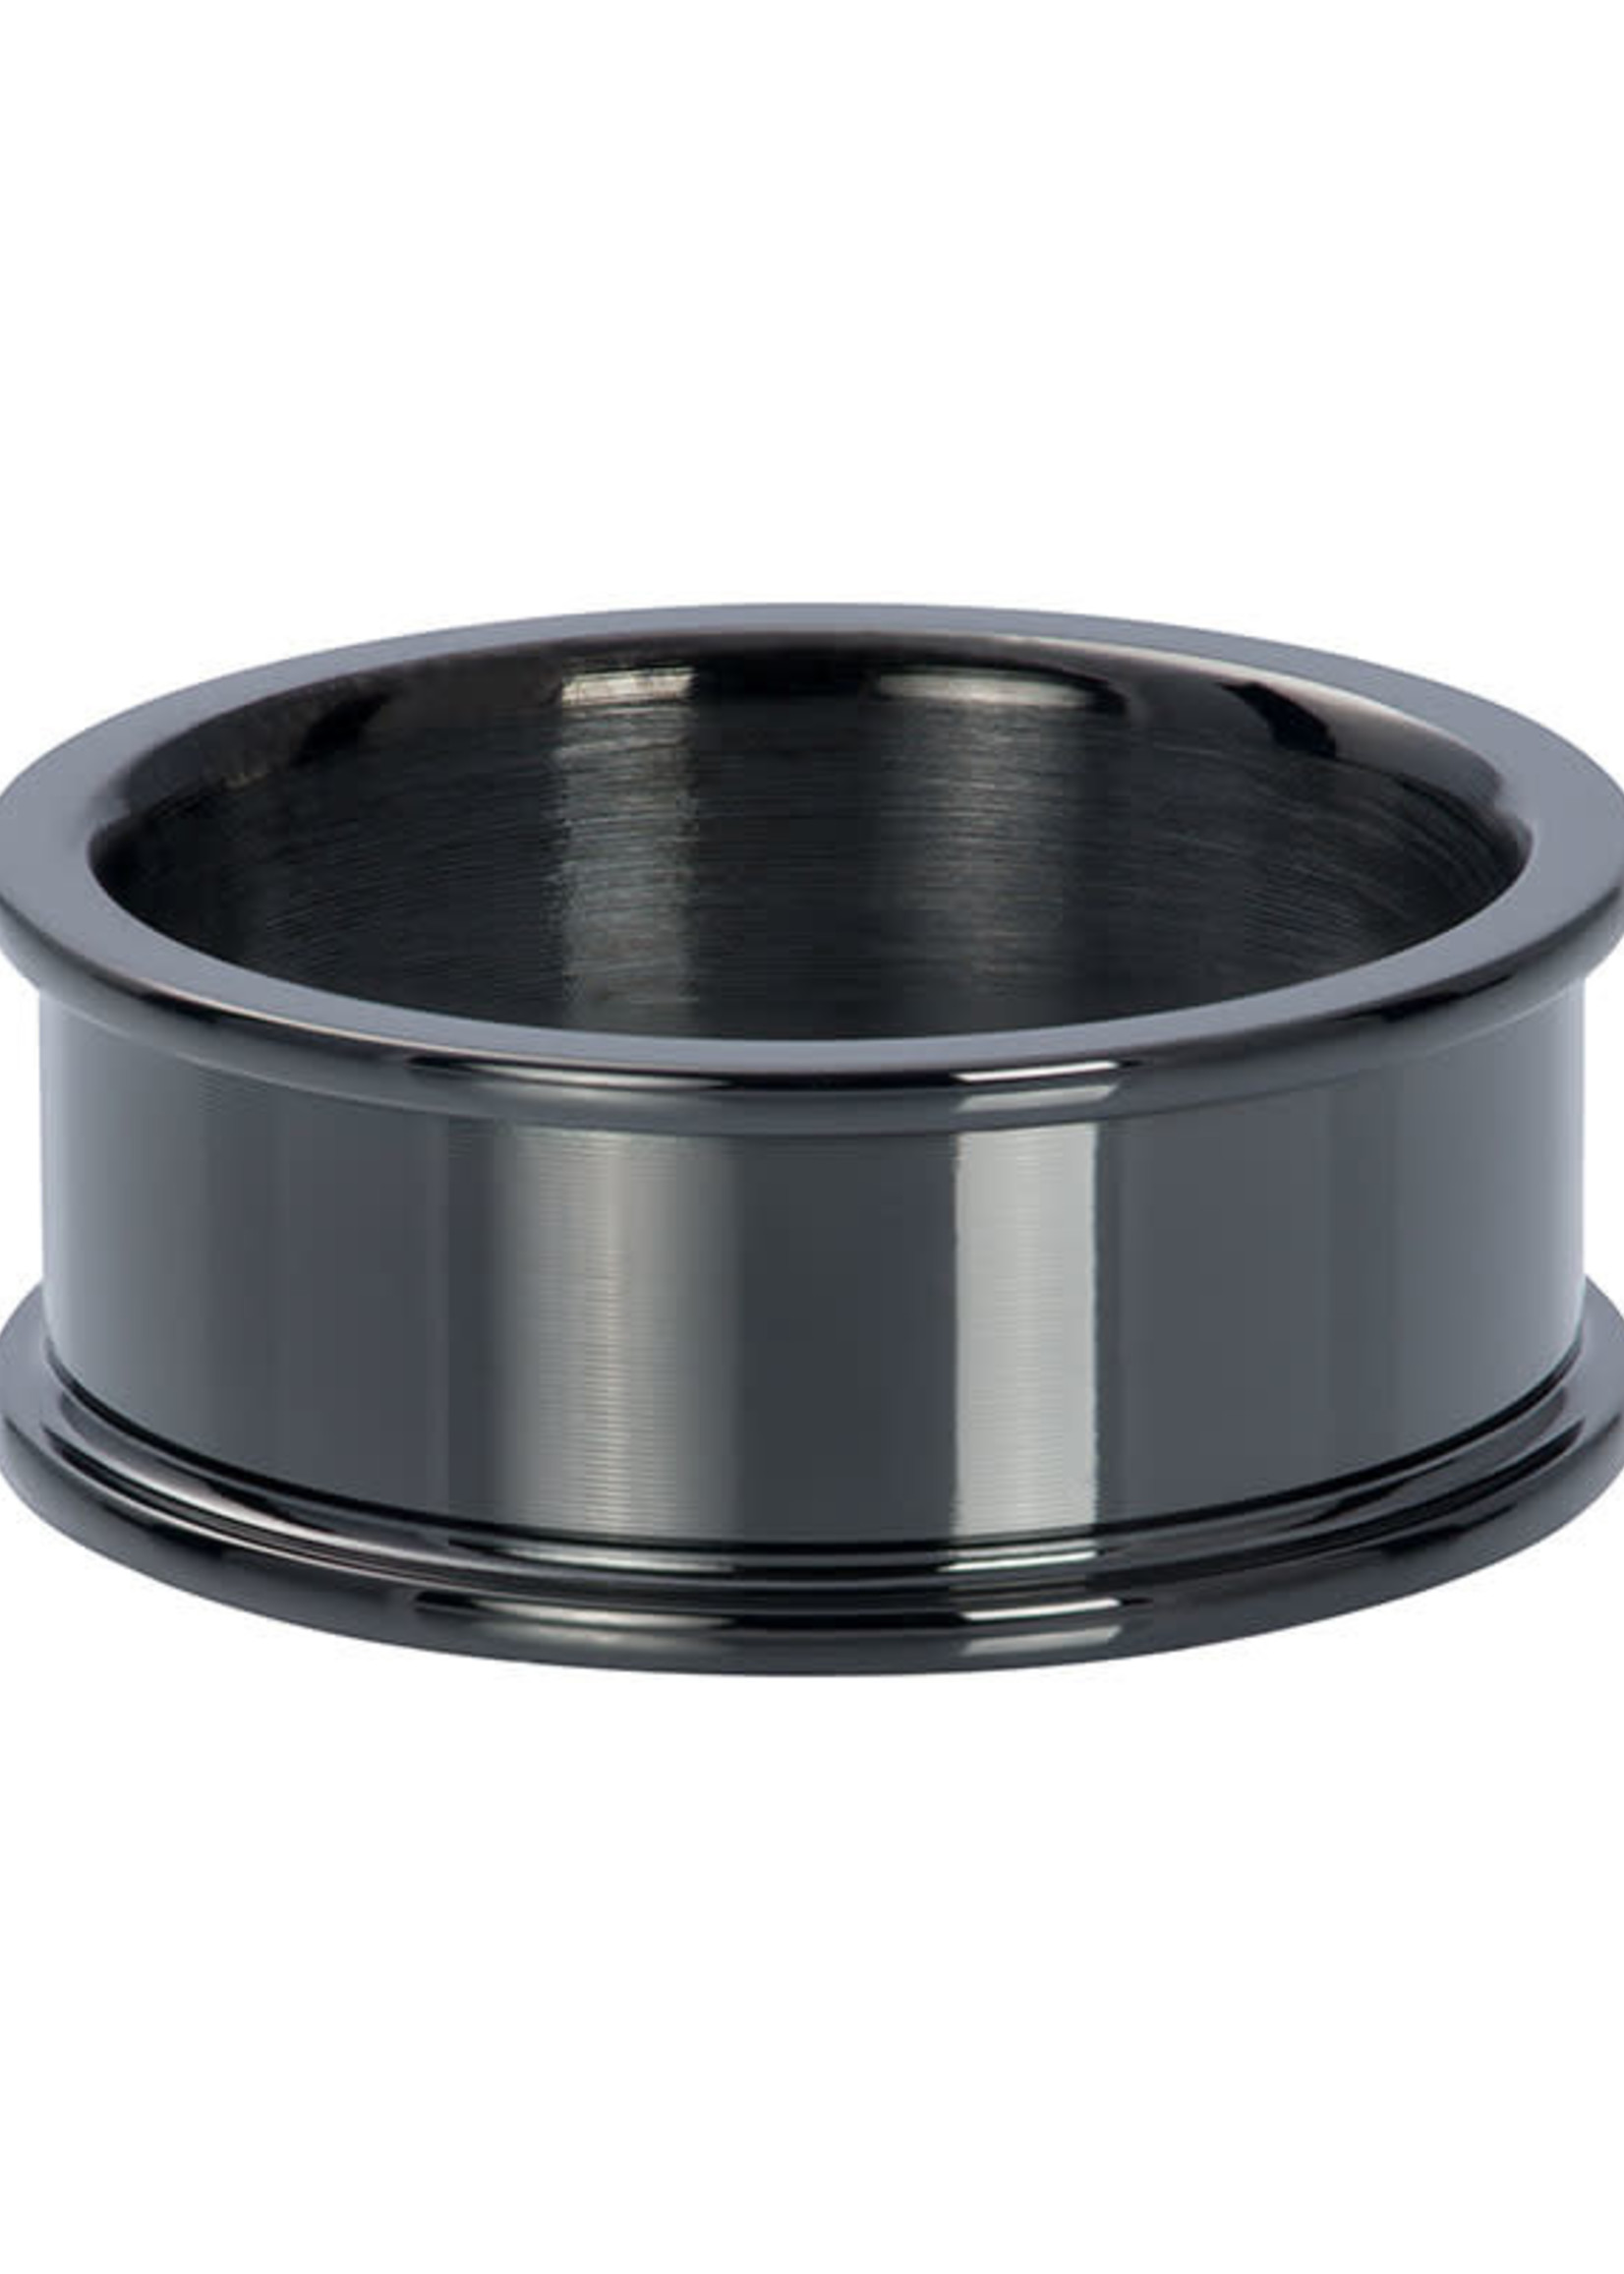 Basishuls zwart 8mm